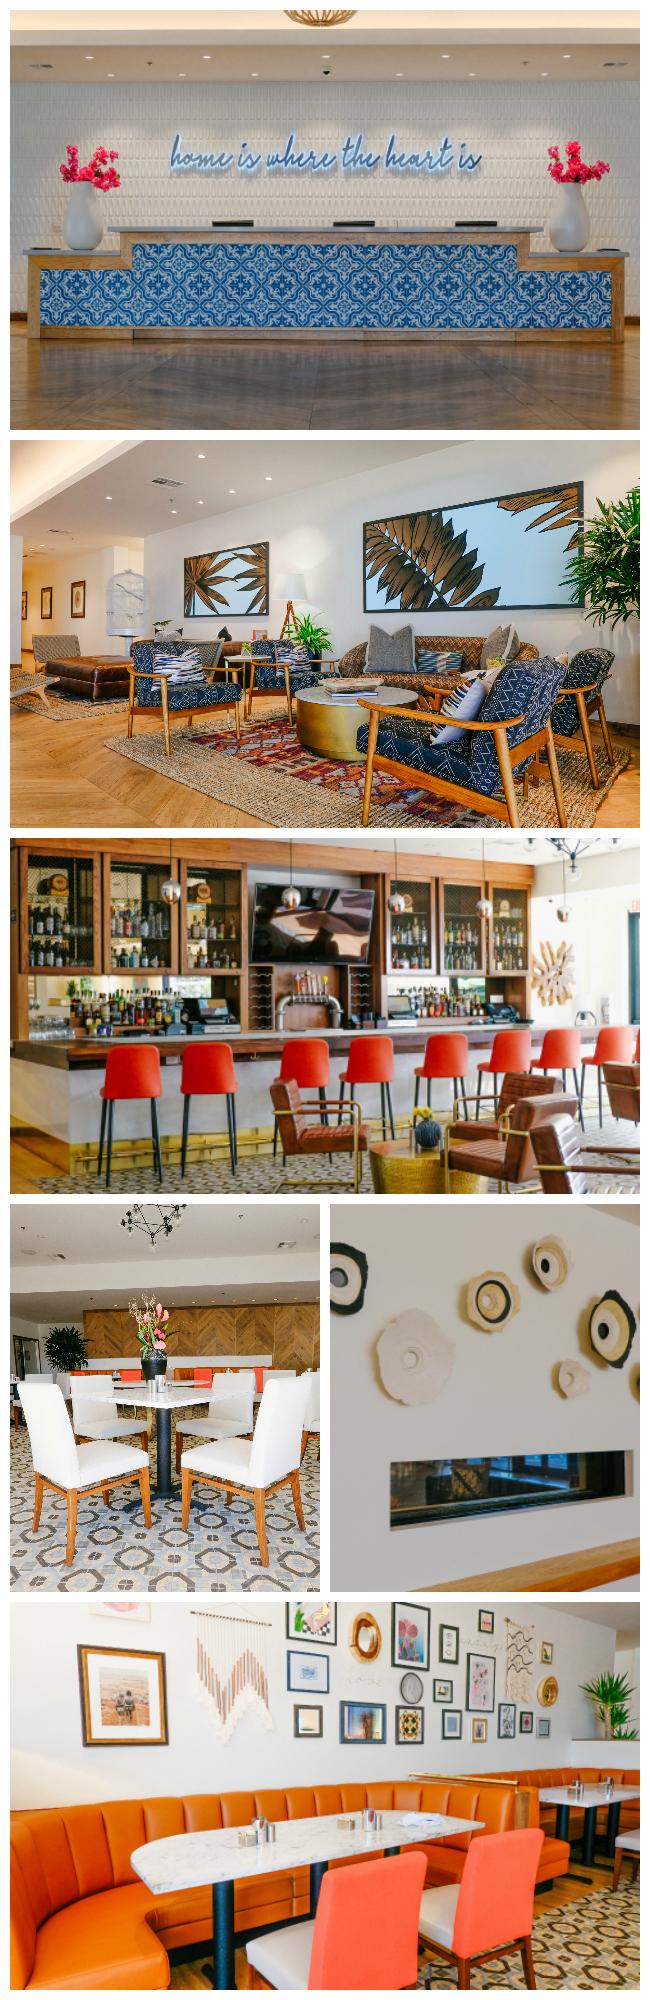 The beautiful lobby at Hotel Adeline in Scottsdale, AZ